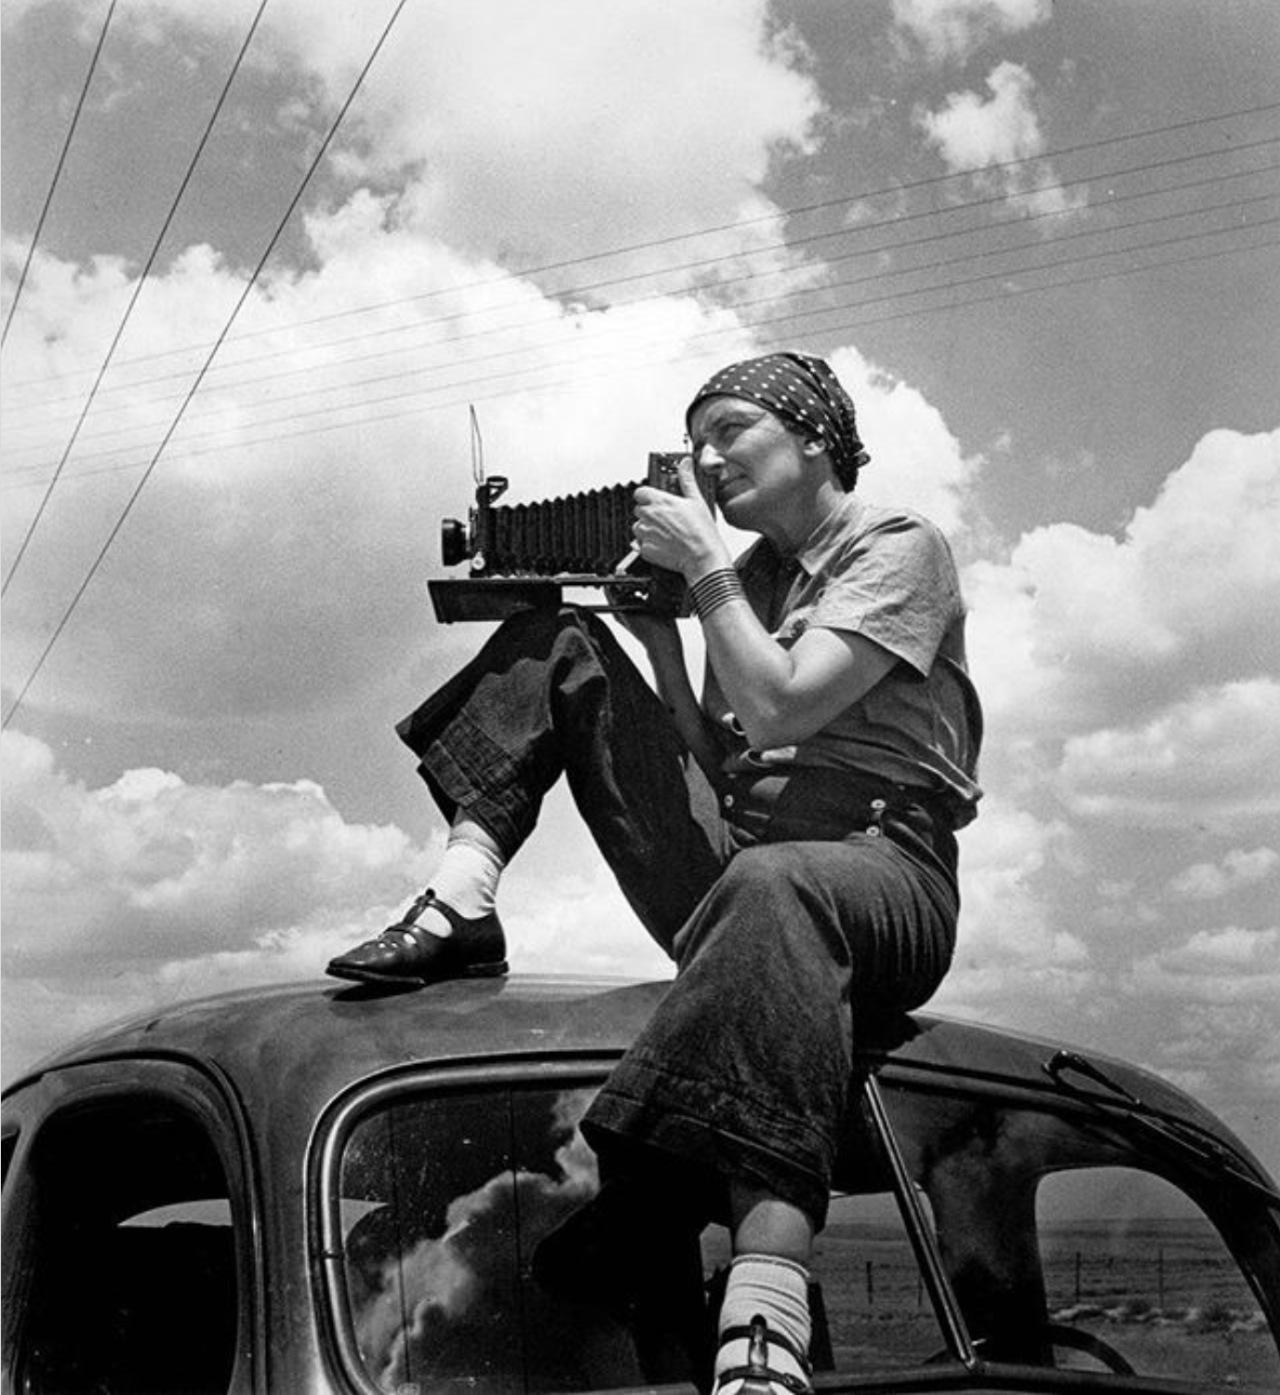 Dorothea Lange and her Graflex camera